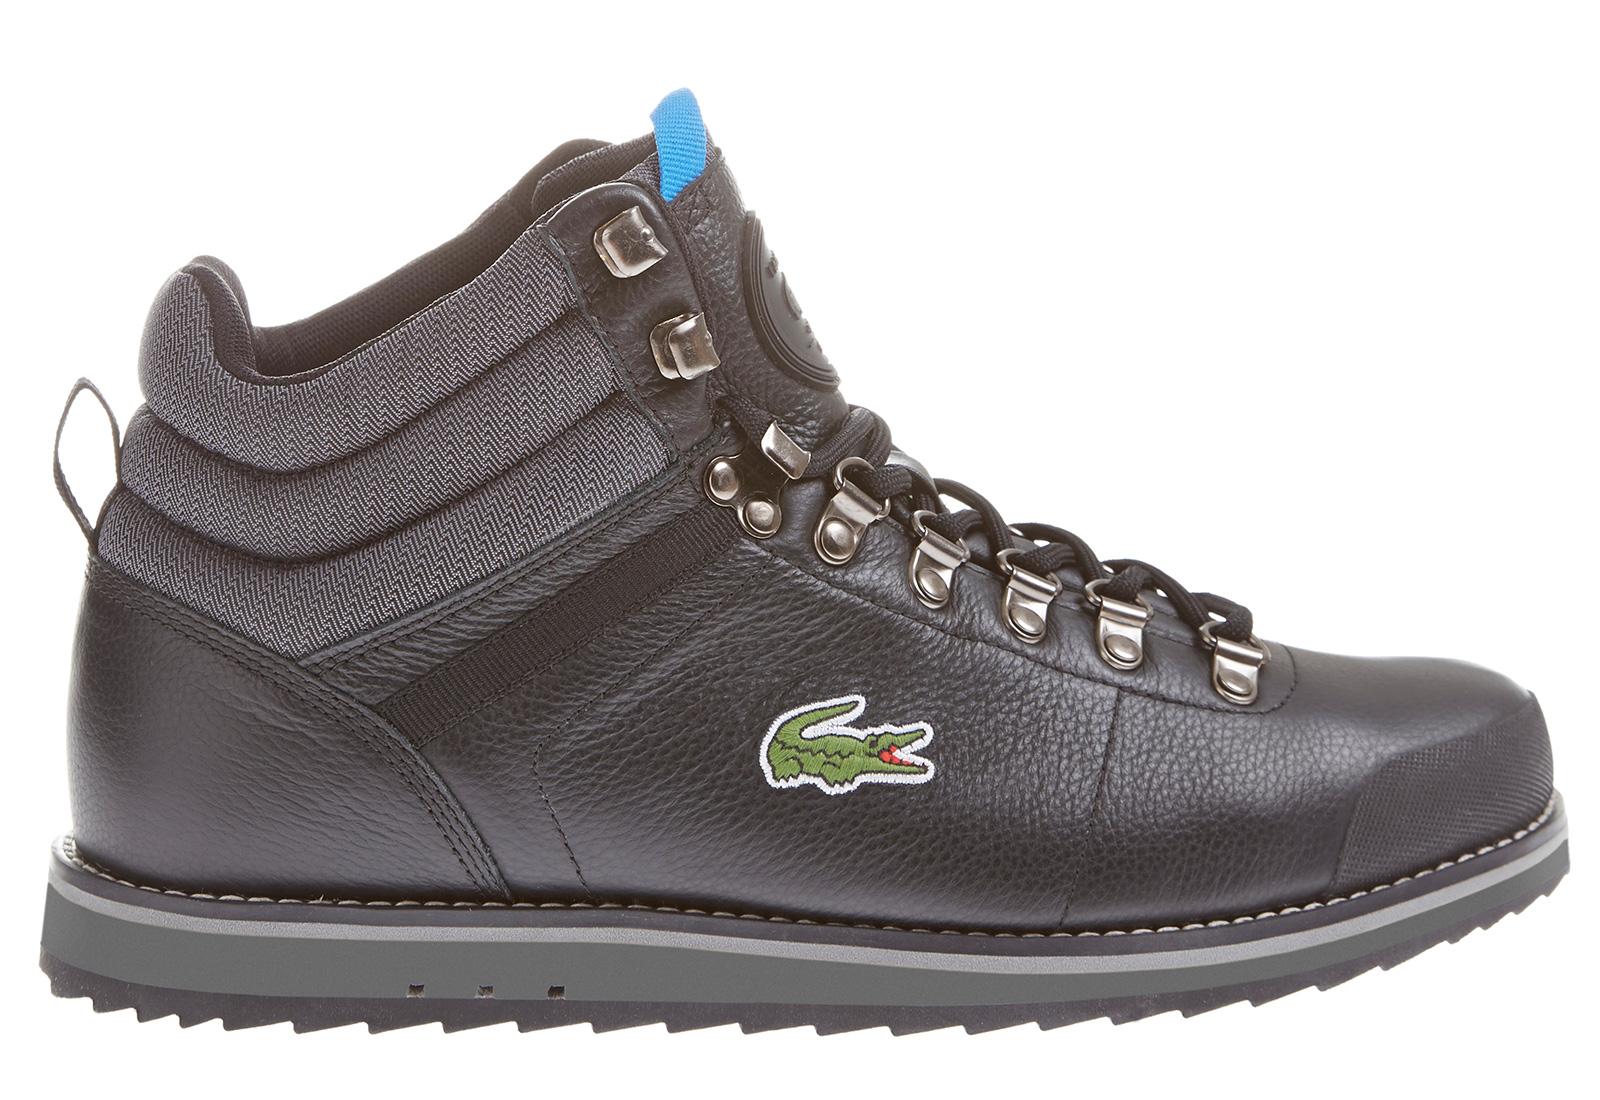 Twd Online For Shoes Jarmund Lacoste Shop Spm021202h Zx ordBEQCWex